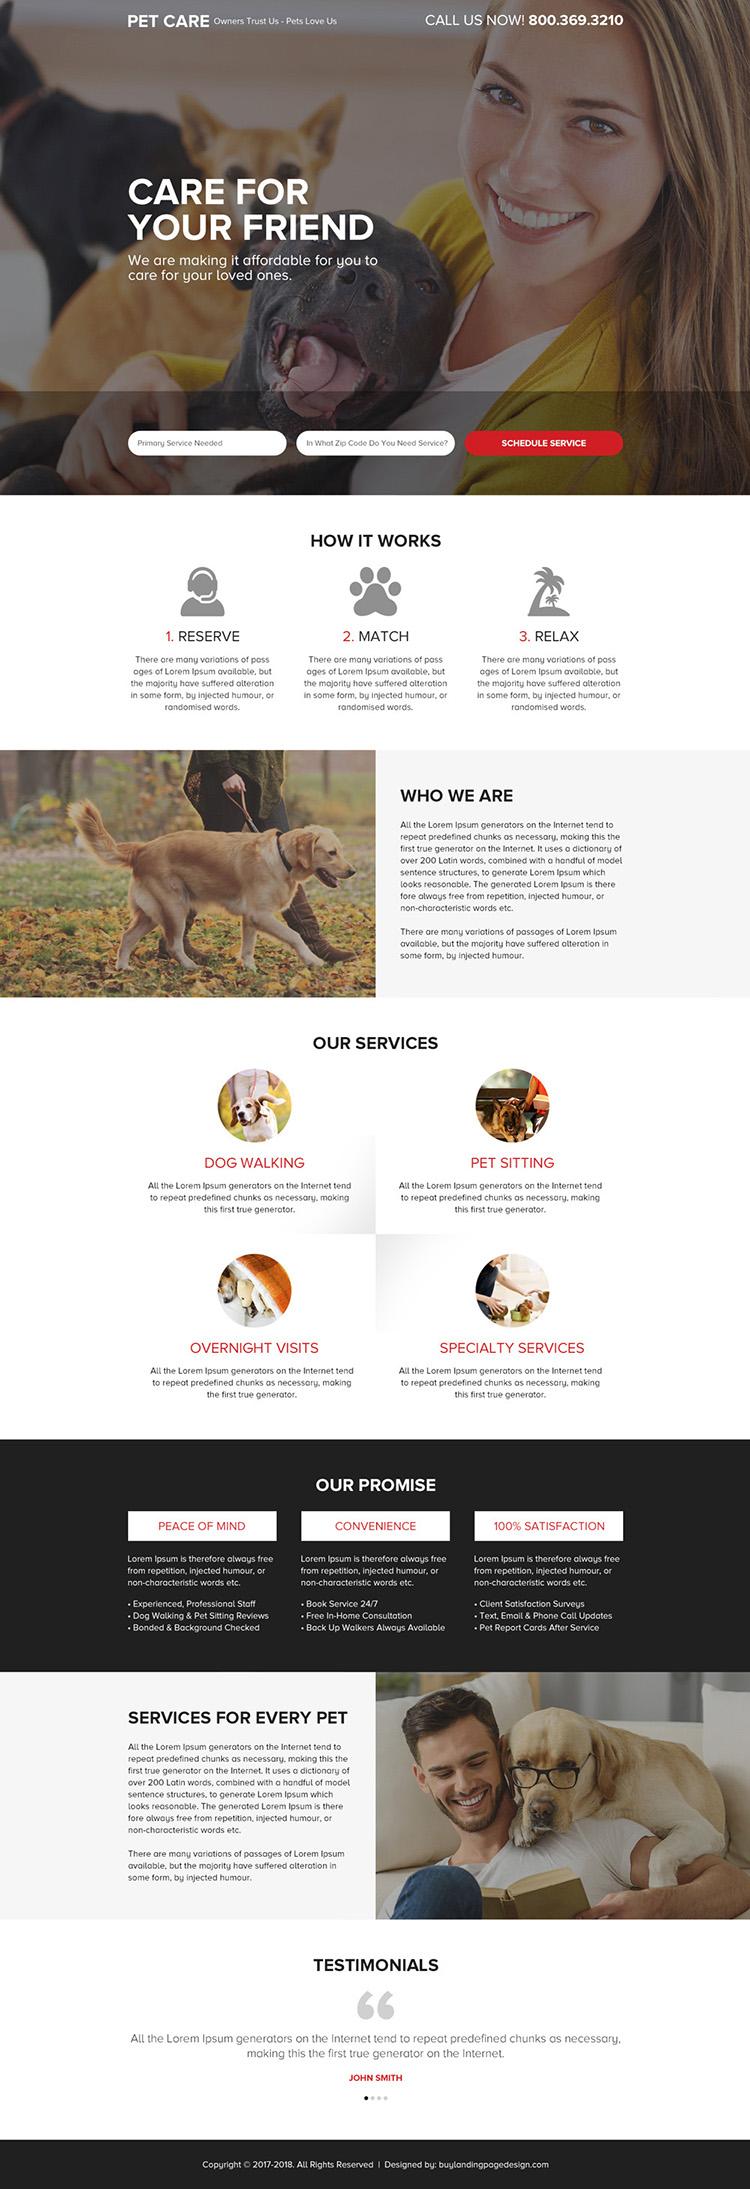 pet care service responsive landing page